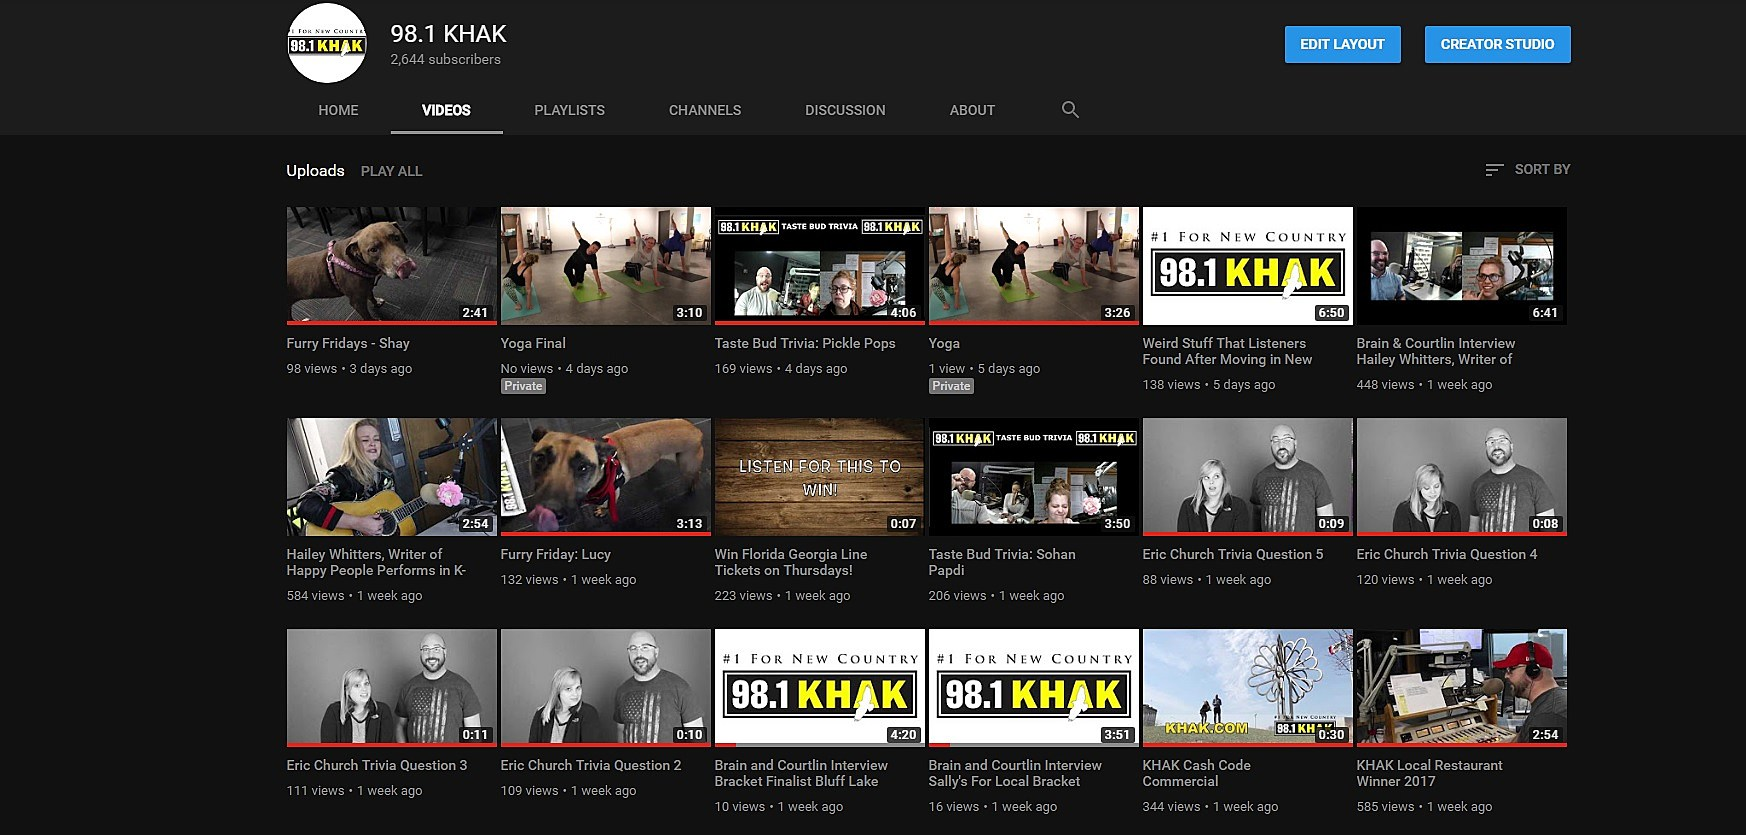 YouTube via KHAK